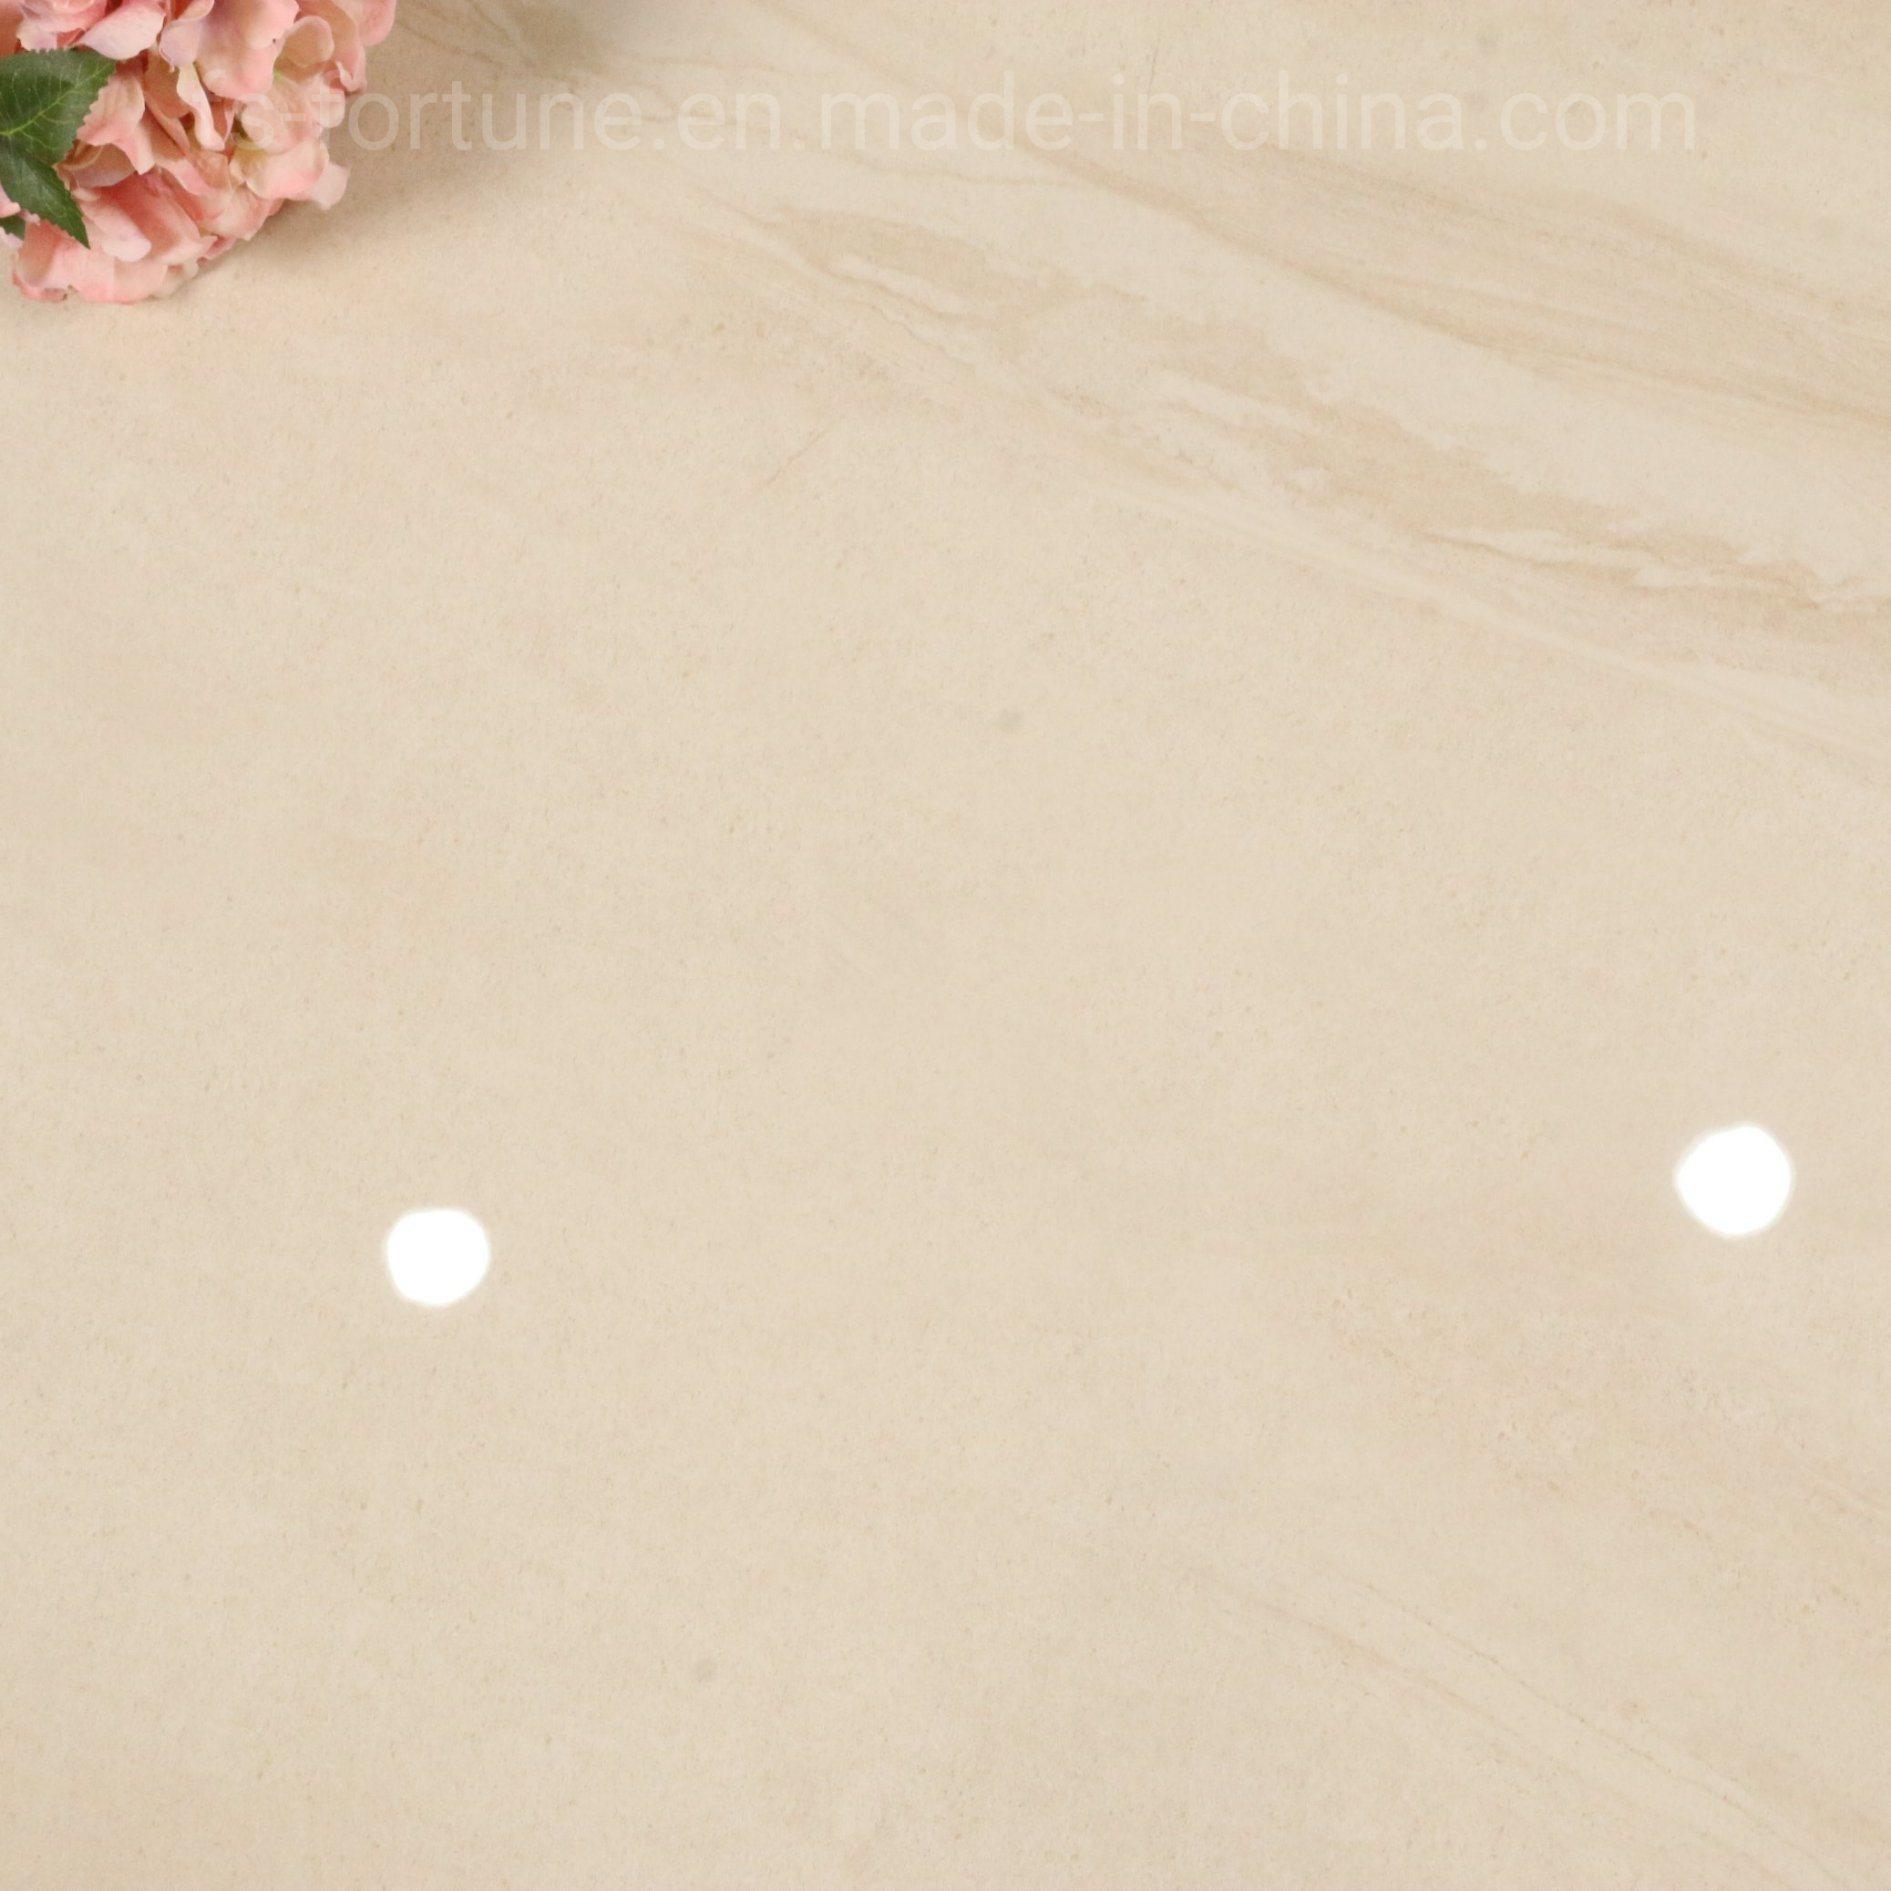 Cream Colored Kitchen Waterproof